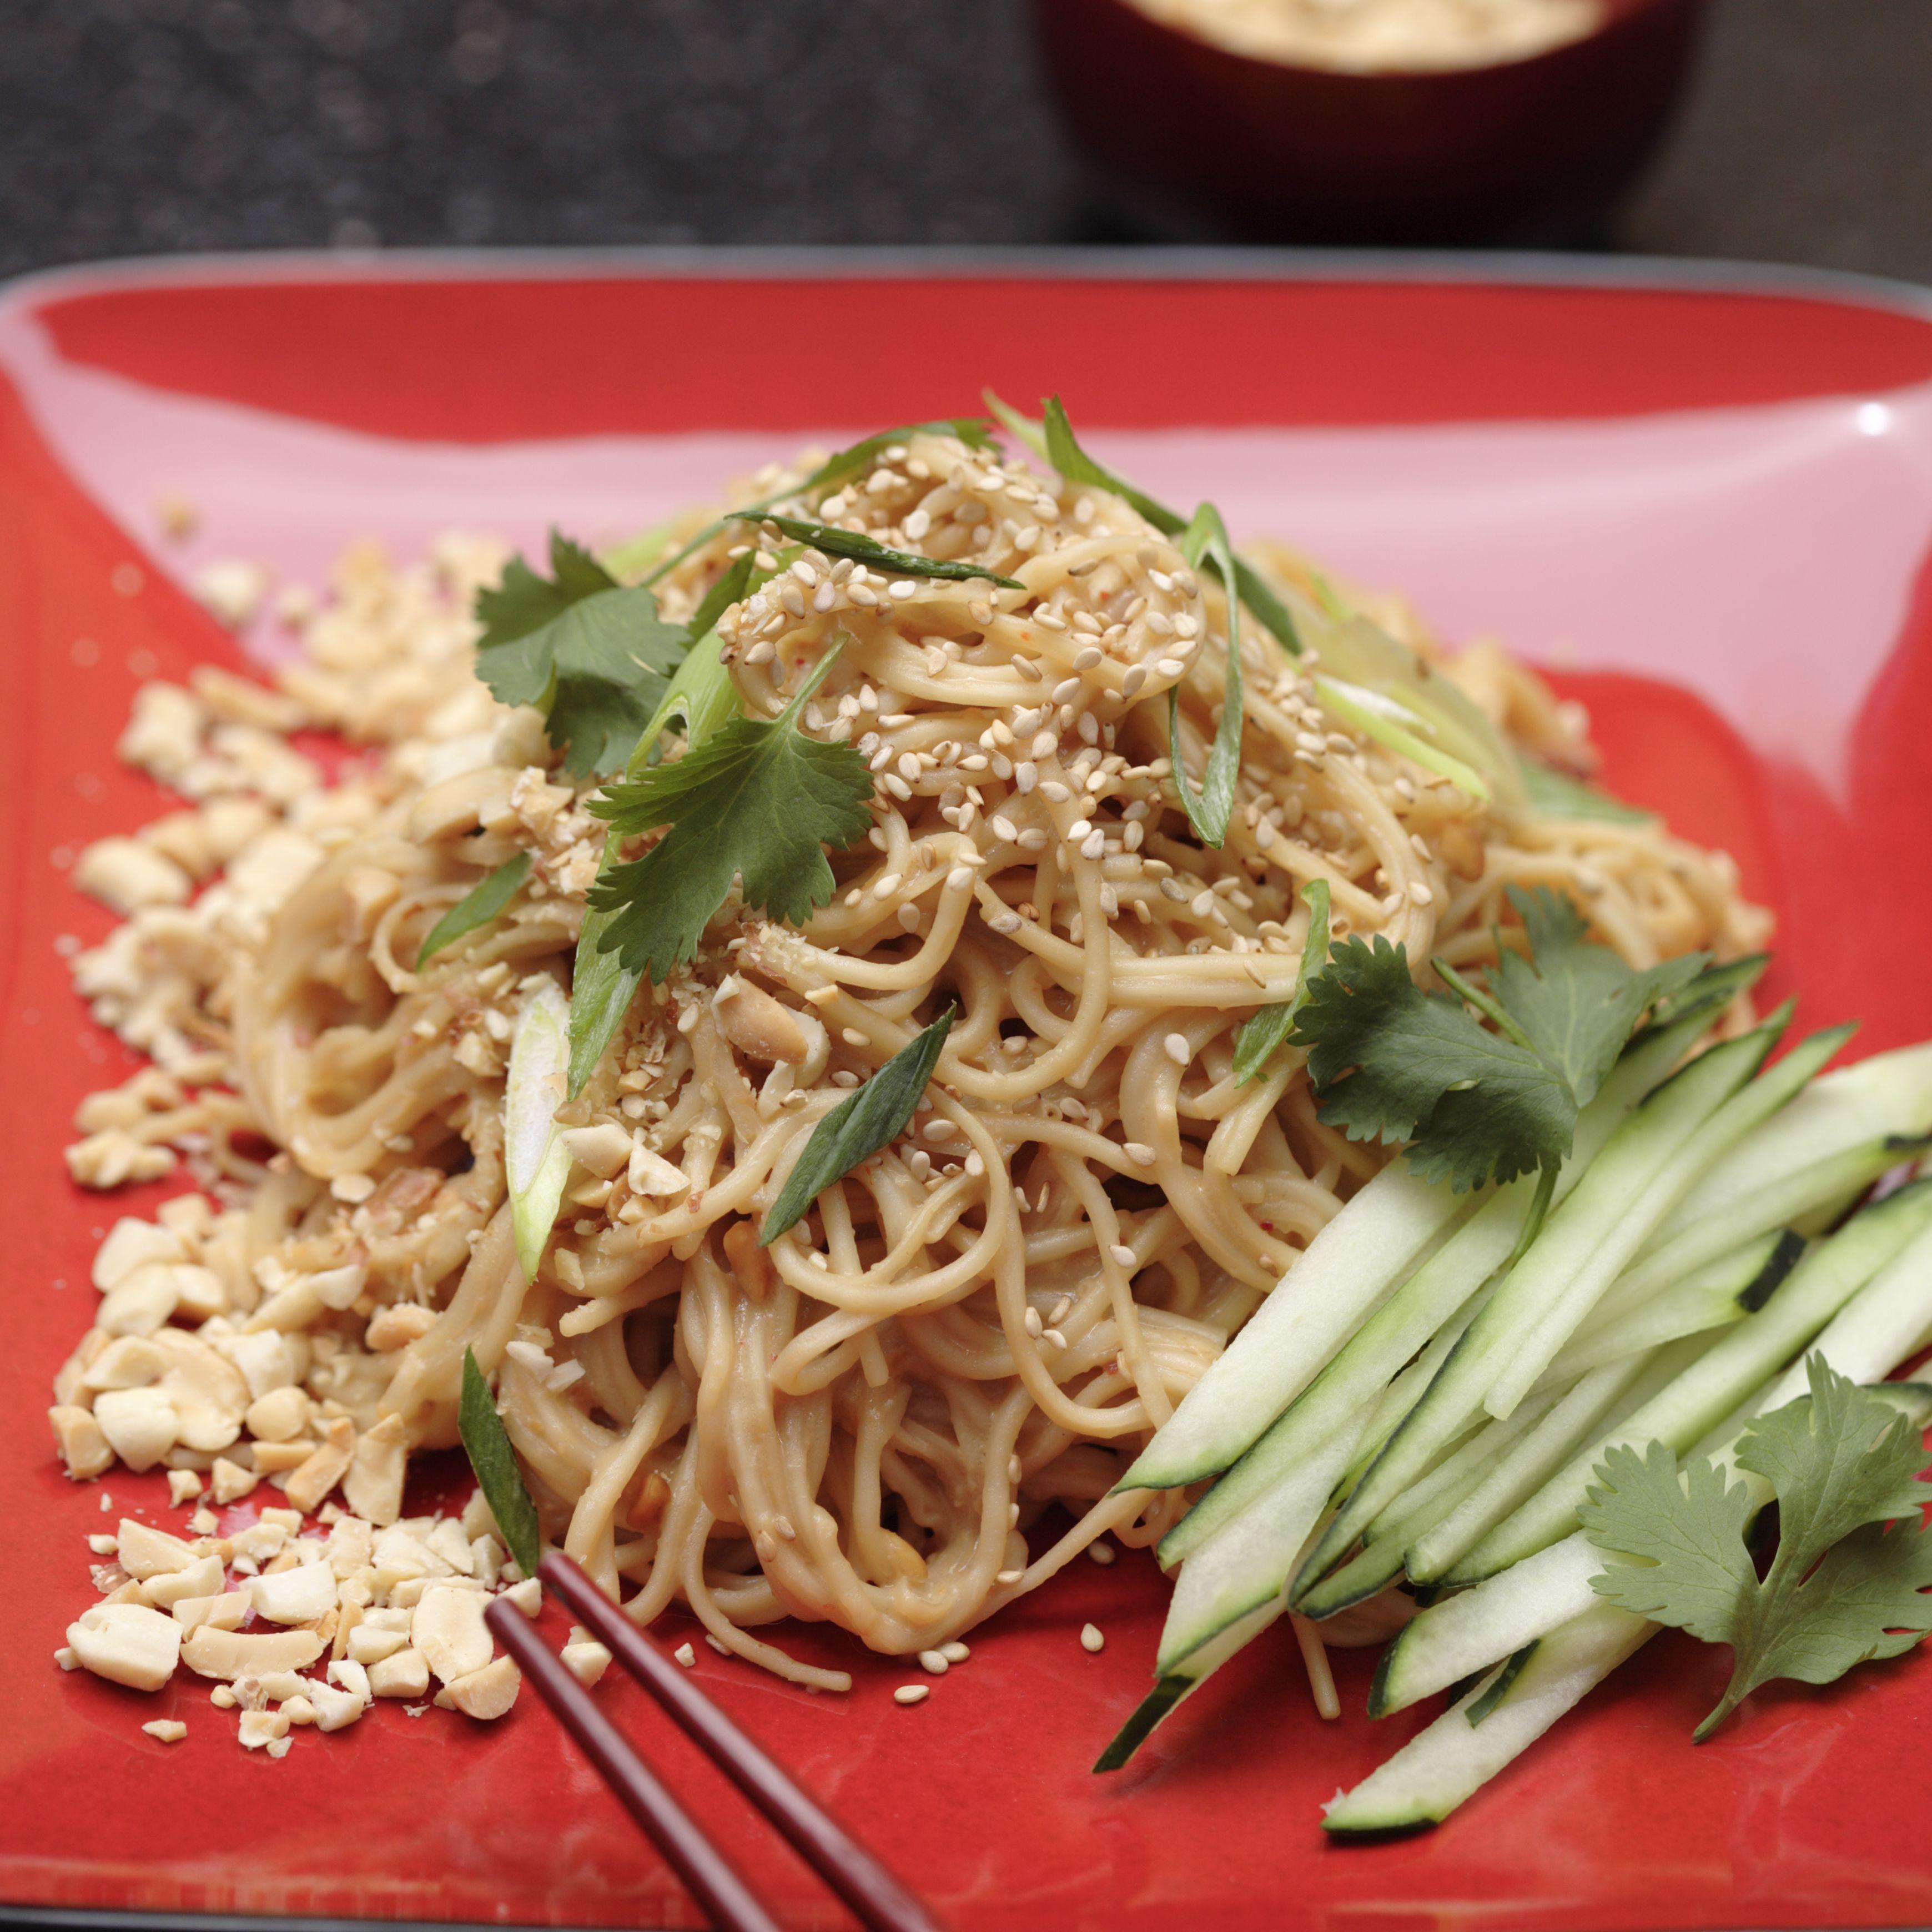 Noodles in peanut sauce